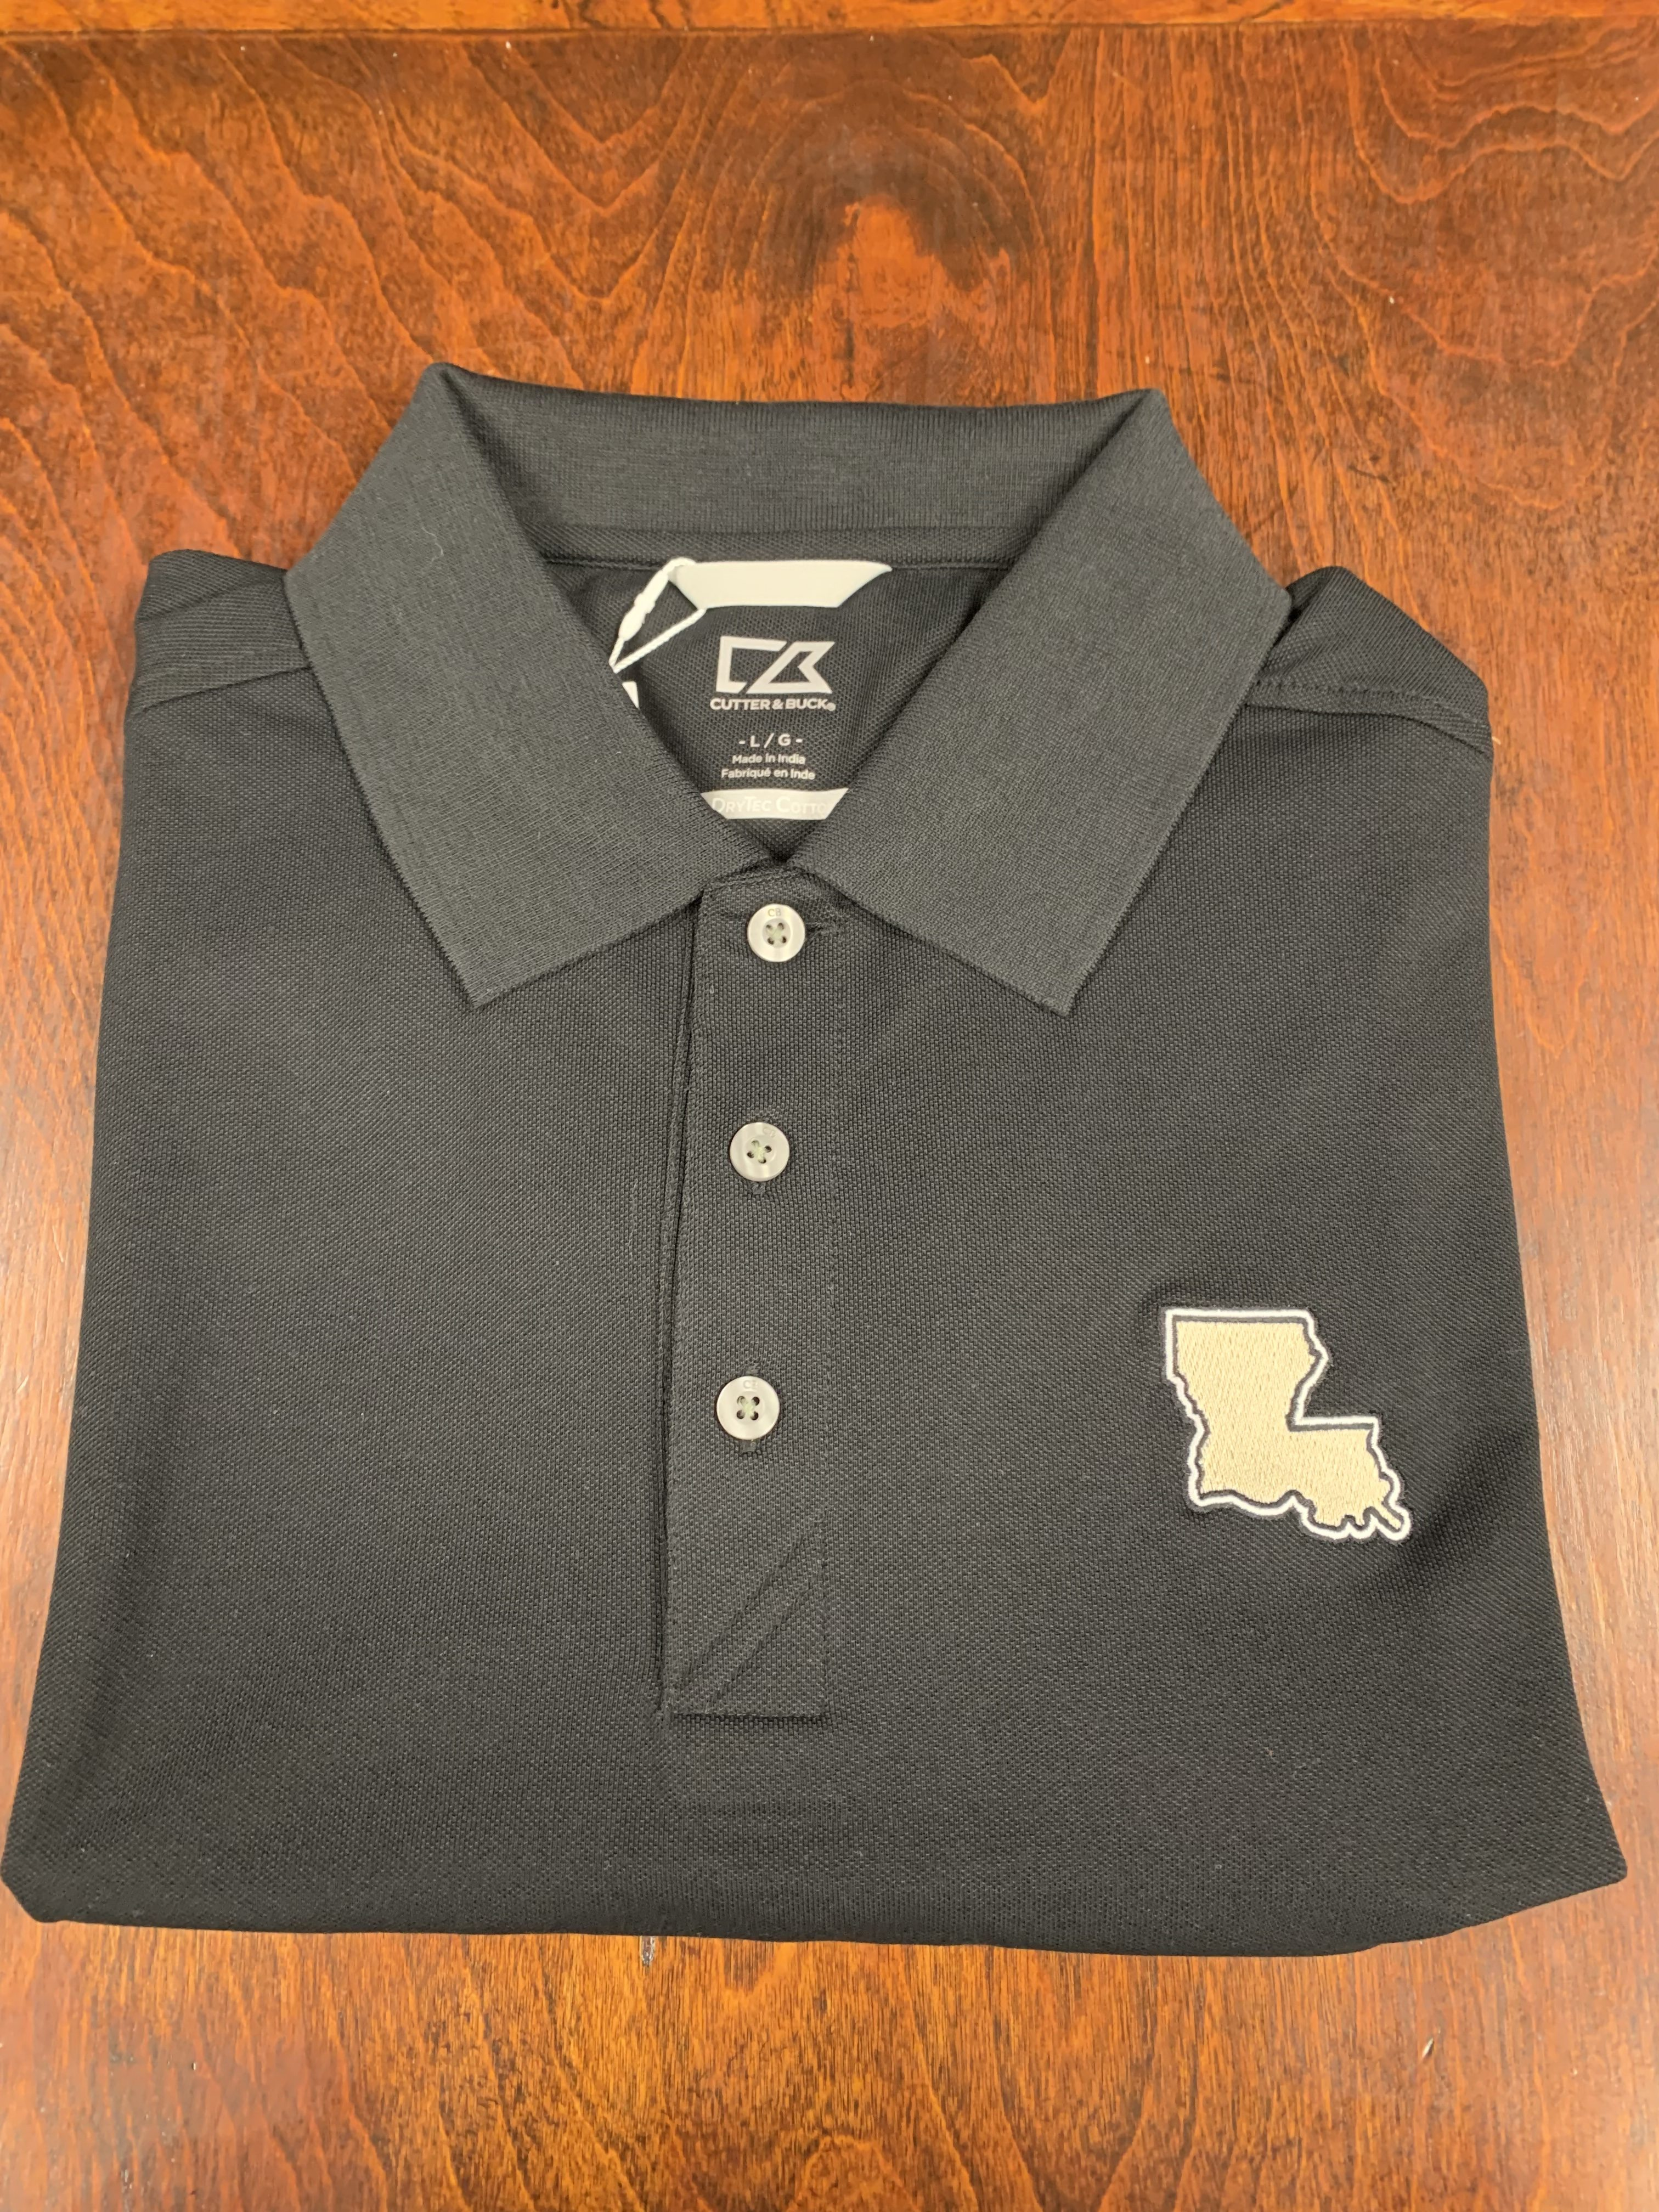 Black & Gold Louisiana Polo